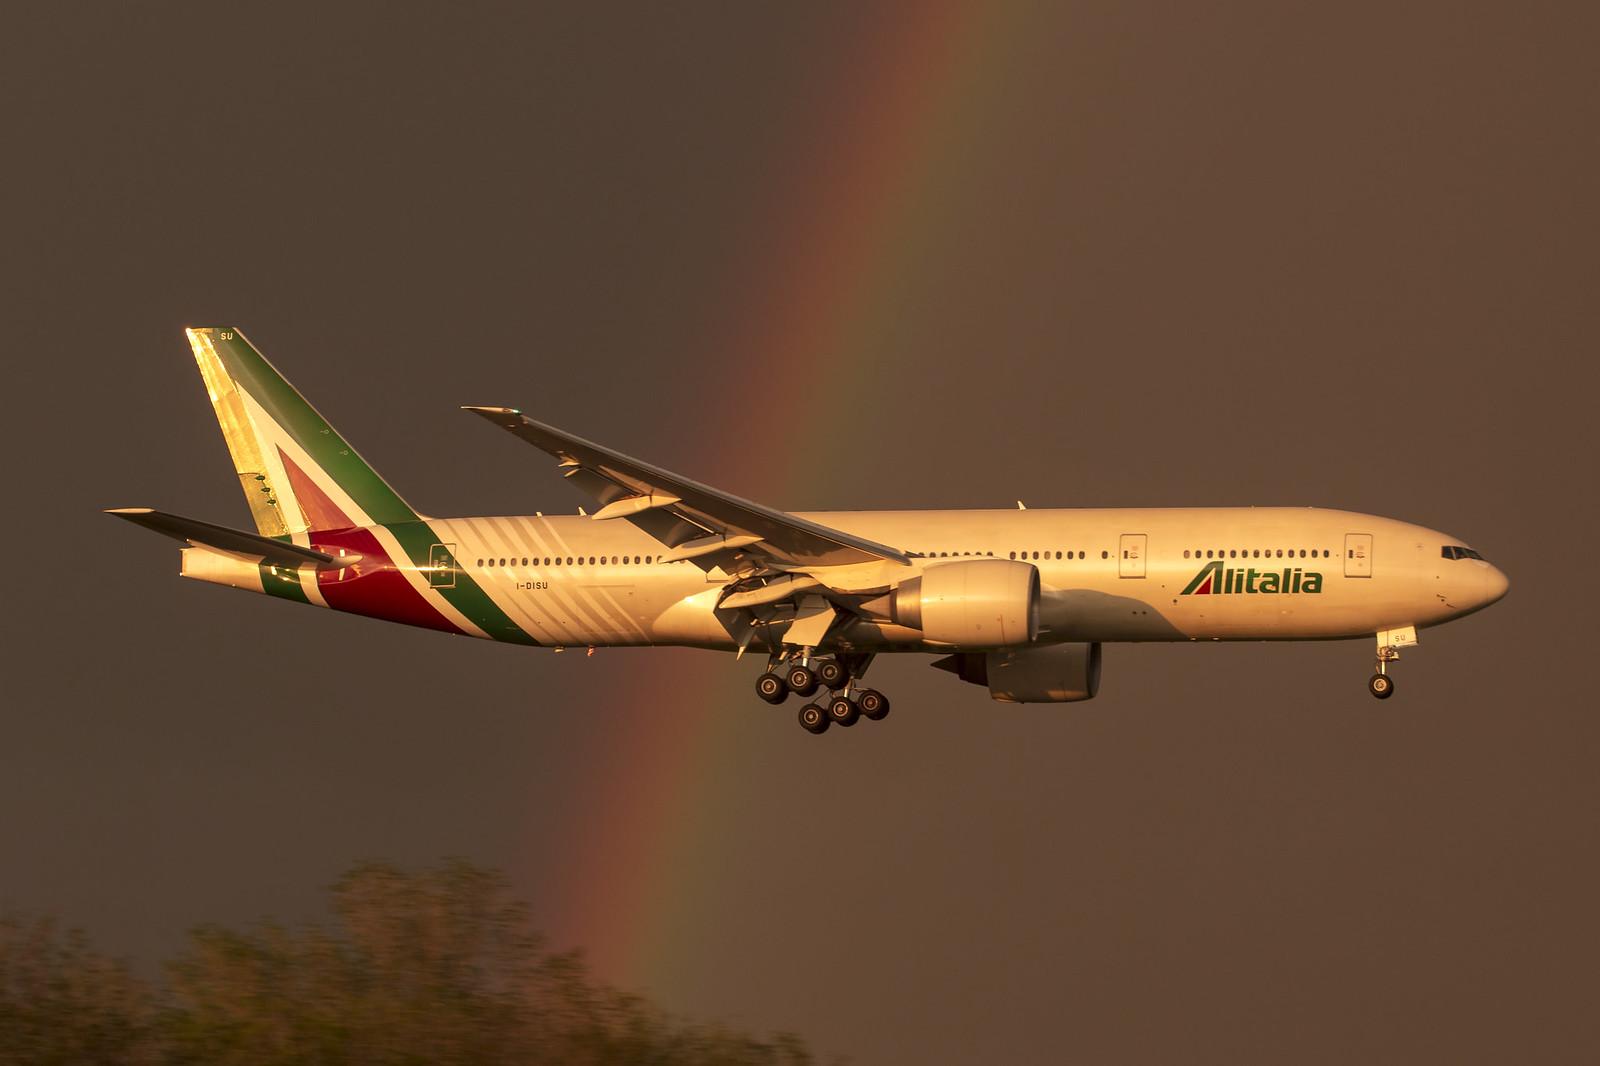 Boeing 777-200ER Alitalia / Foto: Giancarlo Scolari